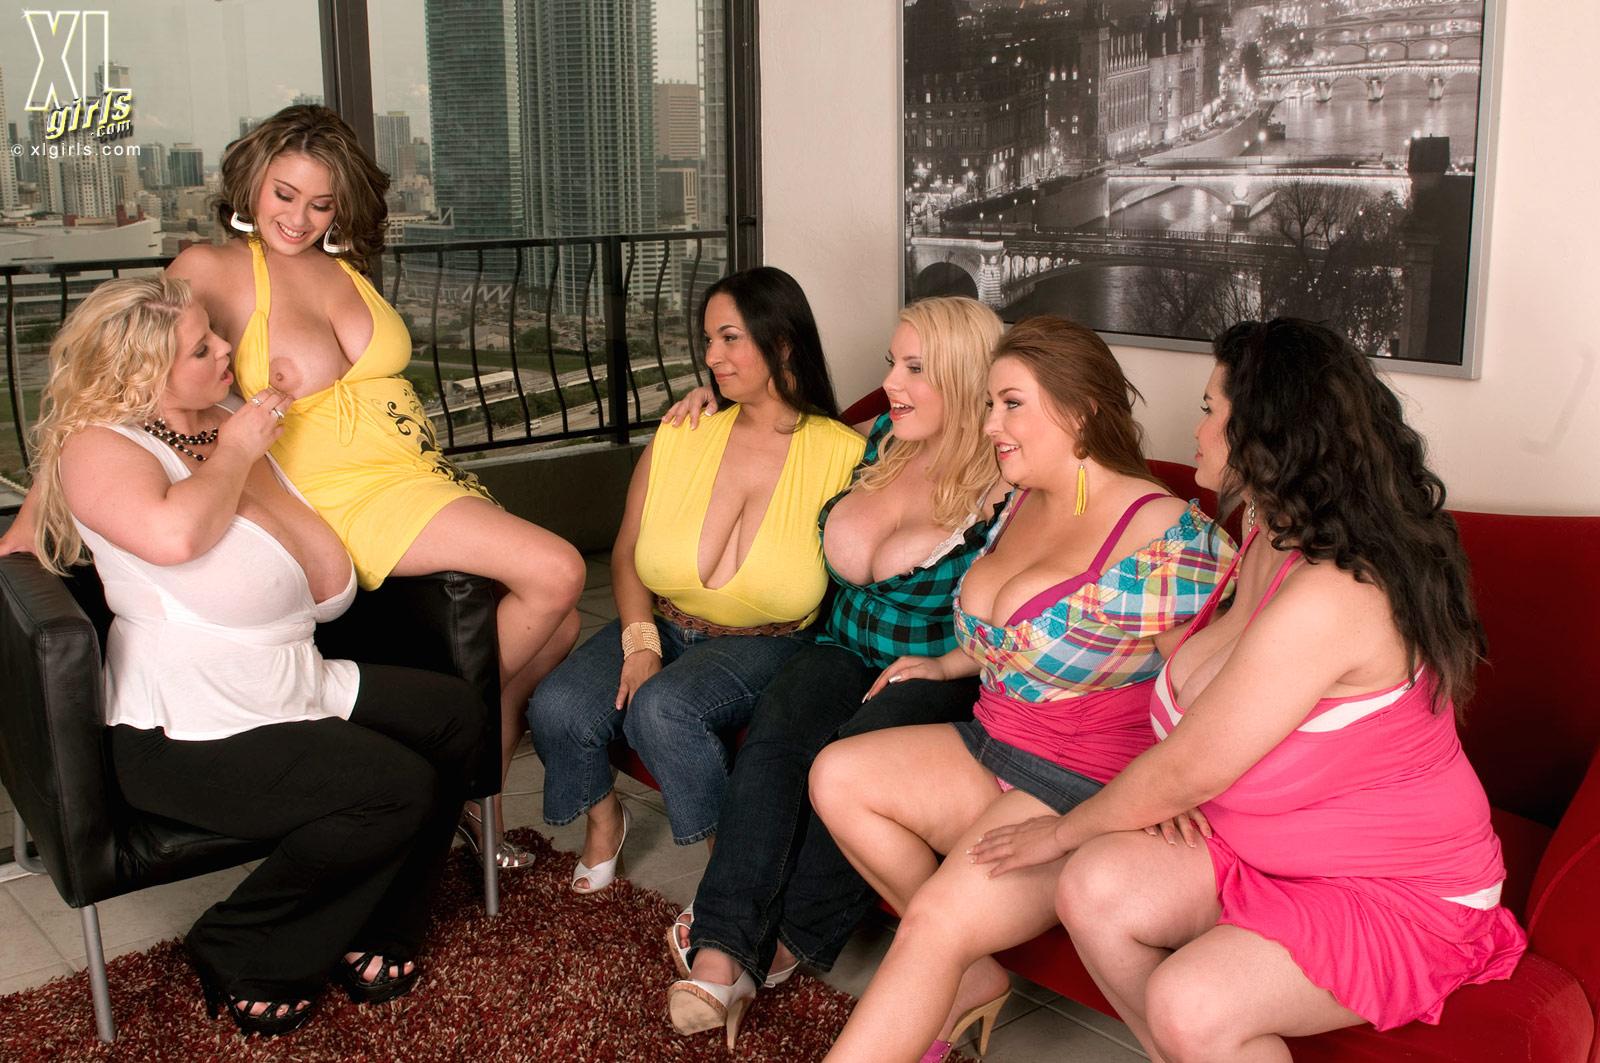 P ump girl orgy